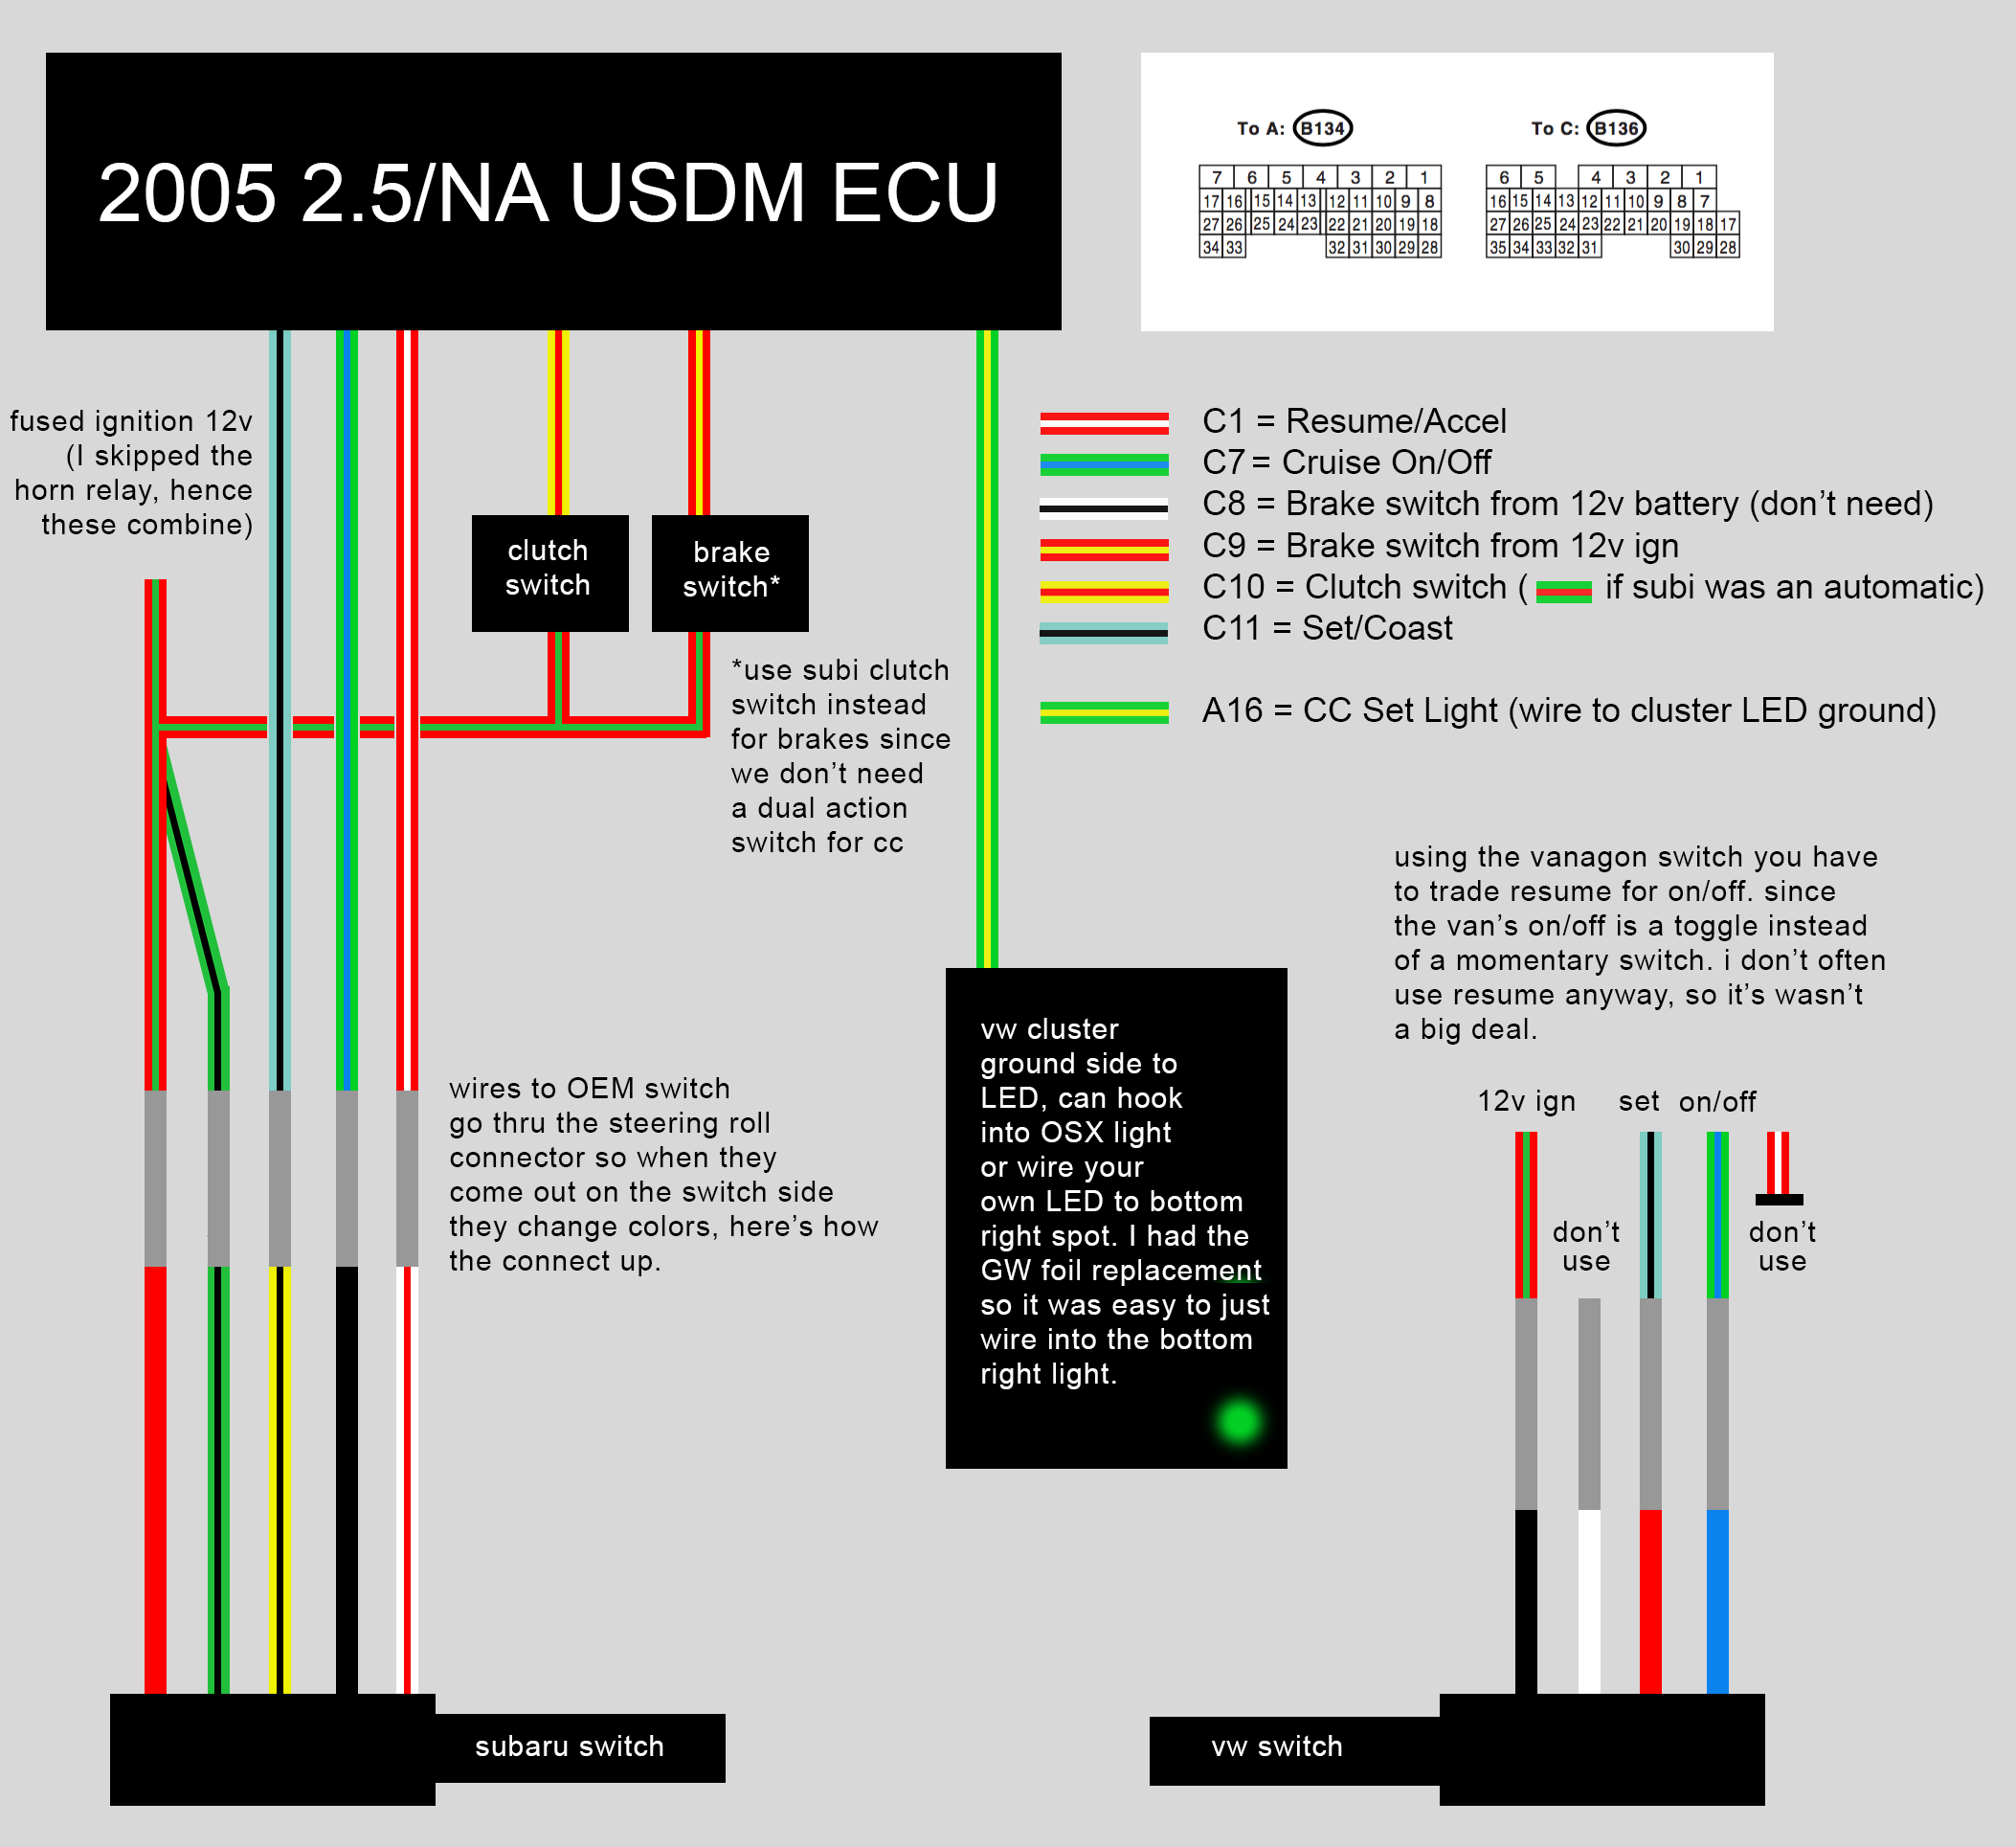 vanagon - view topic - 2005 2.5 subaru dbw ... - thesamba.com subaru vanagon wiring diagram  the samba